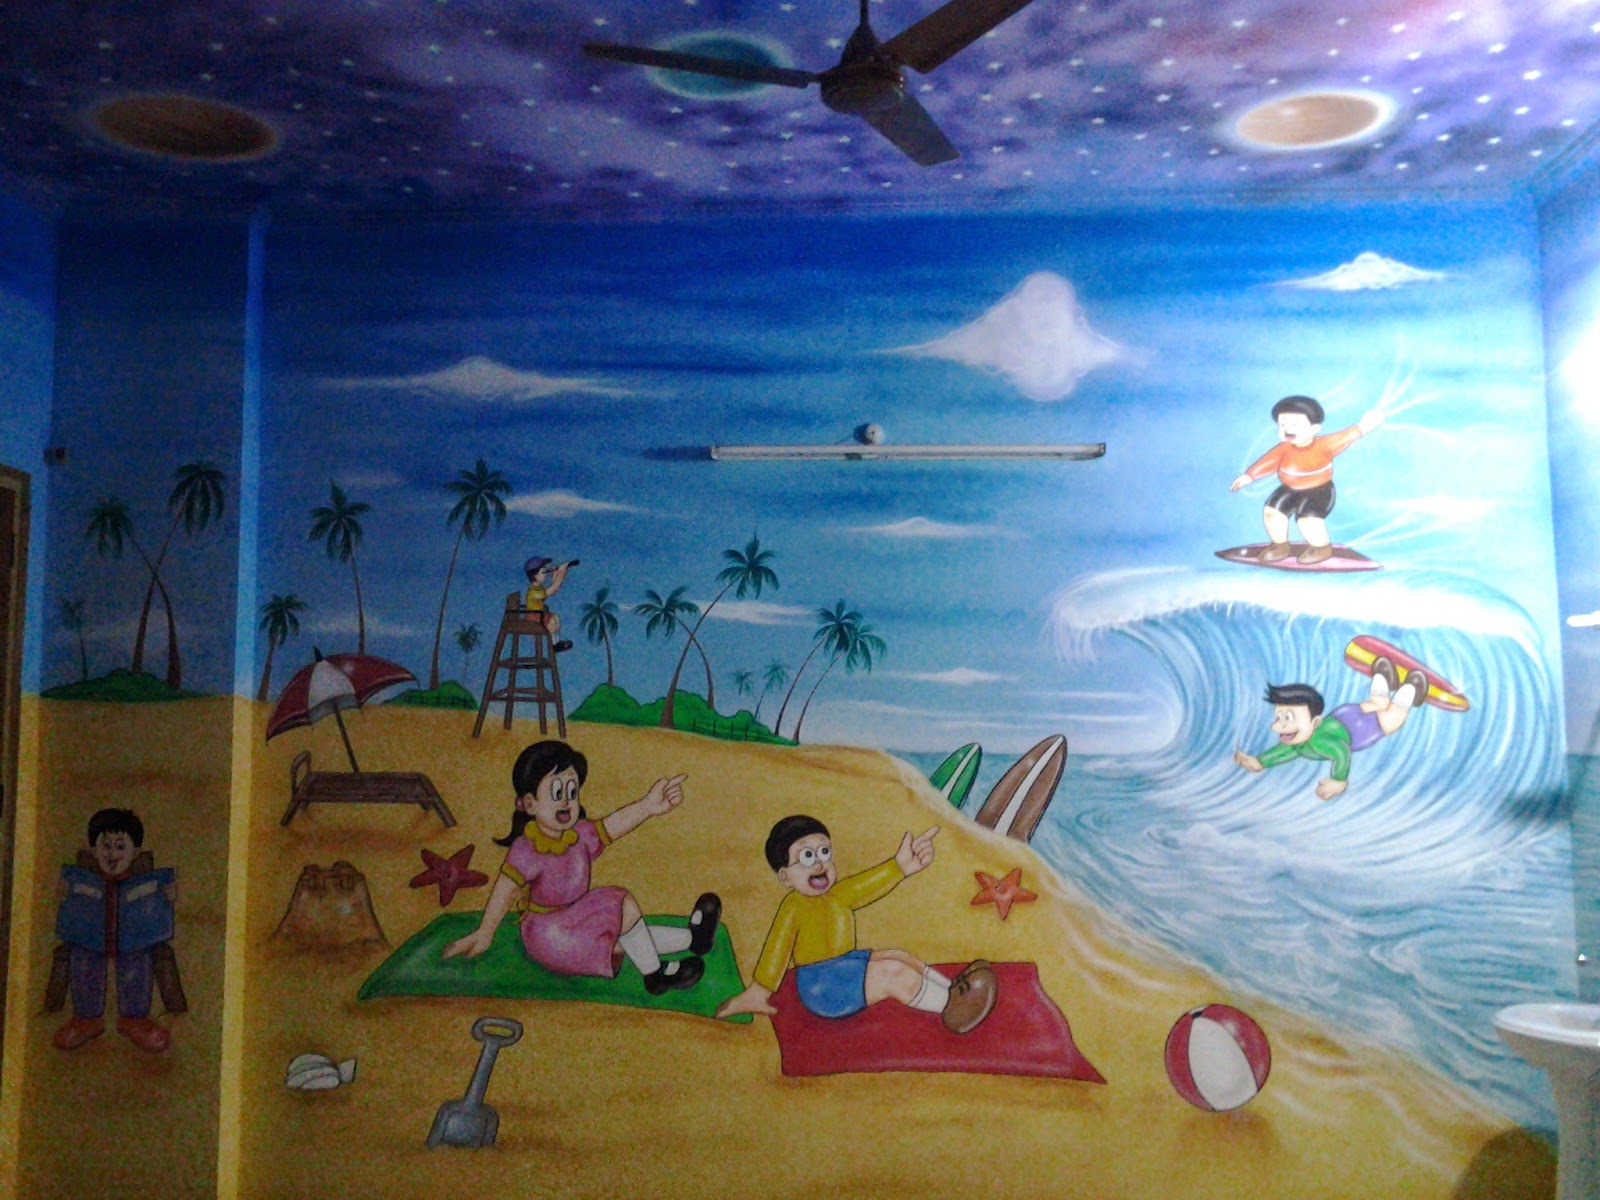 school wall painting play school wall painting 3d cartoon painting kids room painting theme. Black Bedroom Furniture Sets. Home Design Ideas